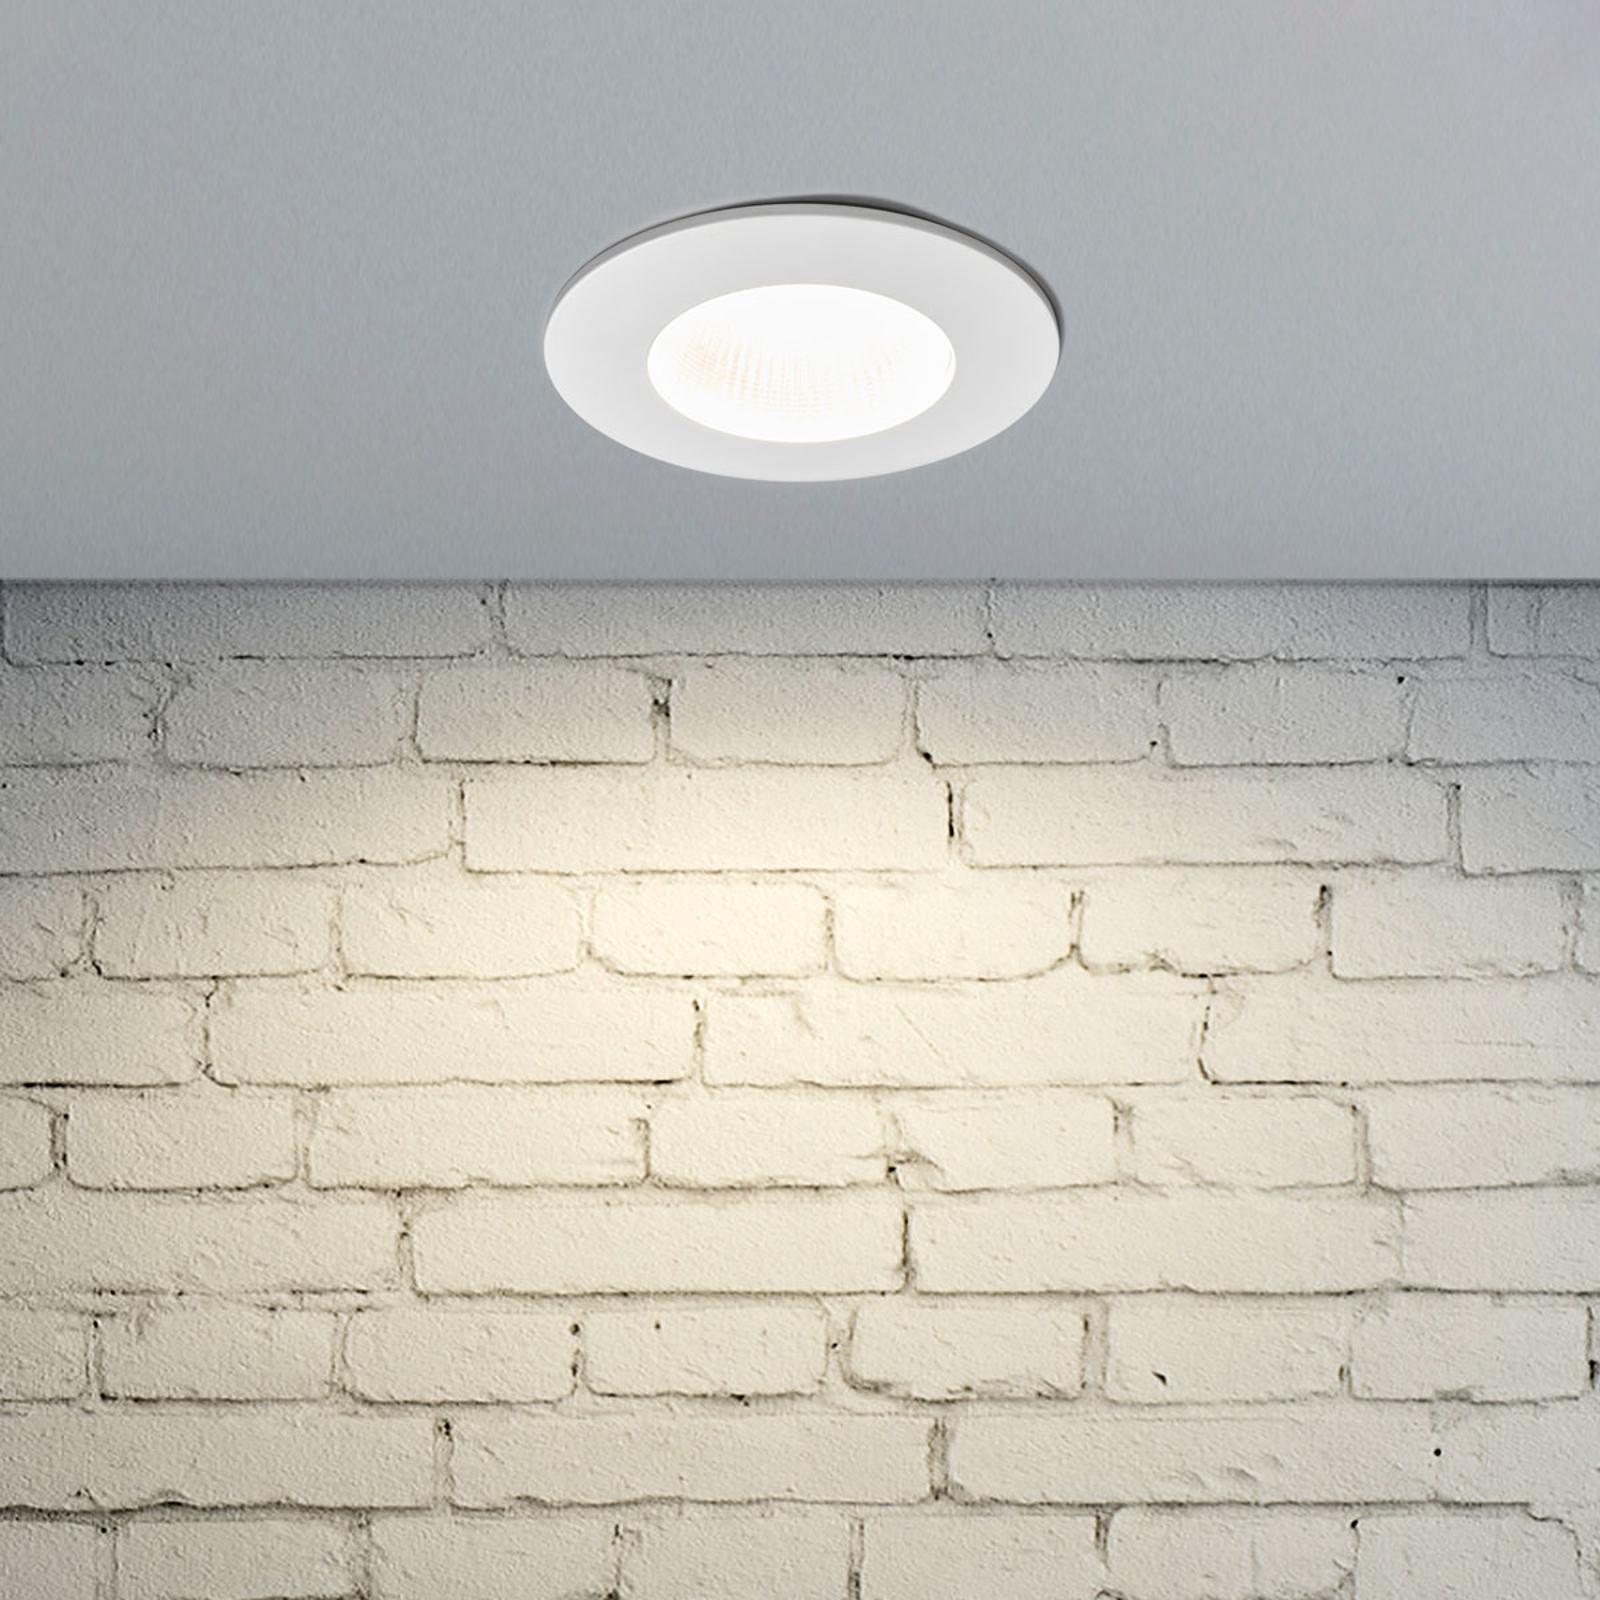 LED-Einbaustrahler Kamilla, weiß, IP65, 11W